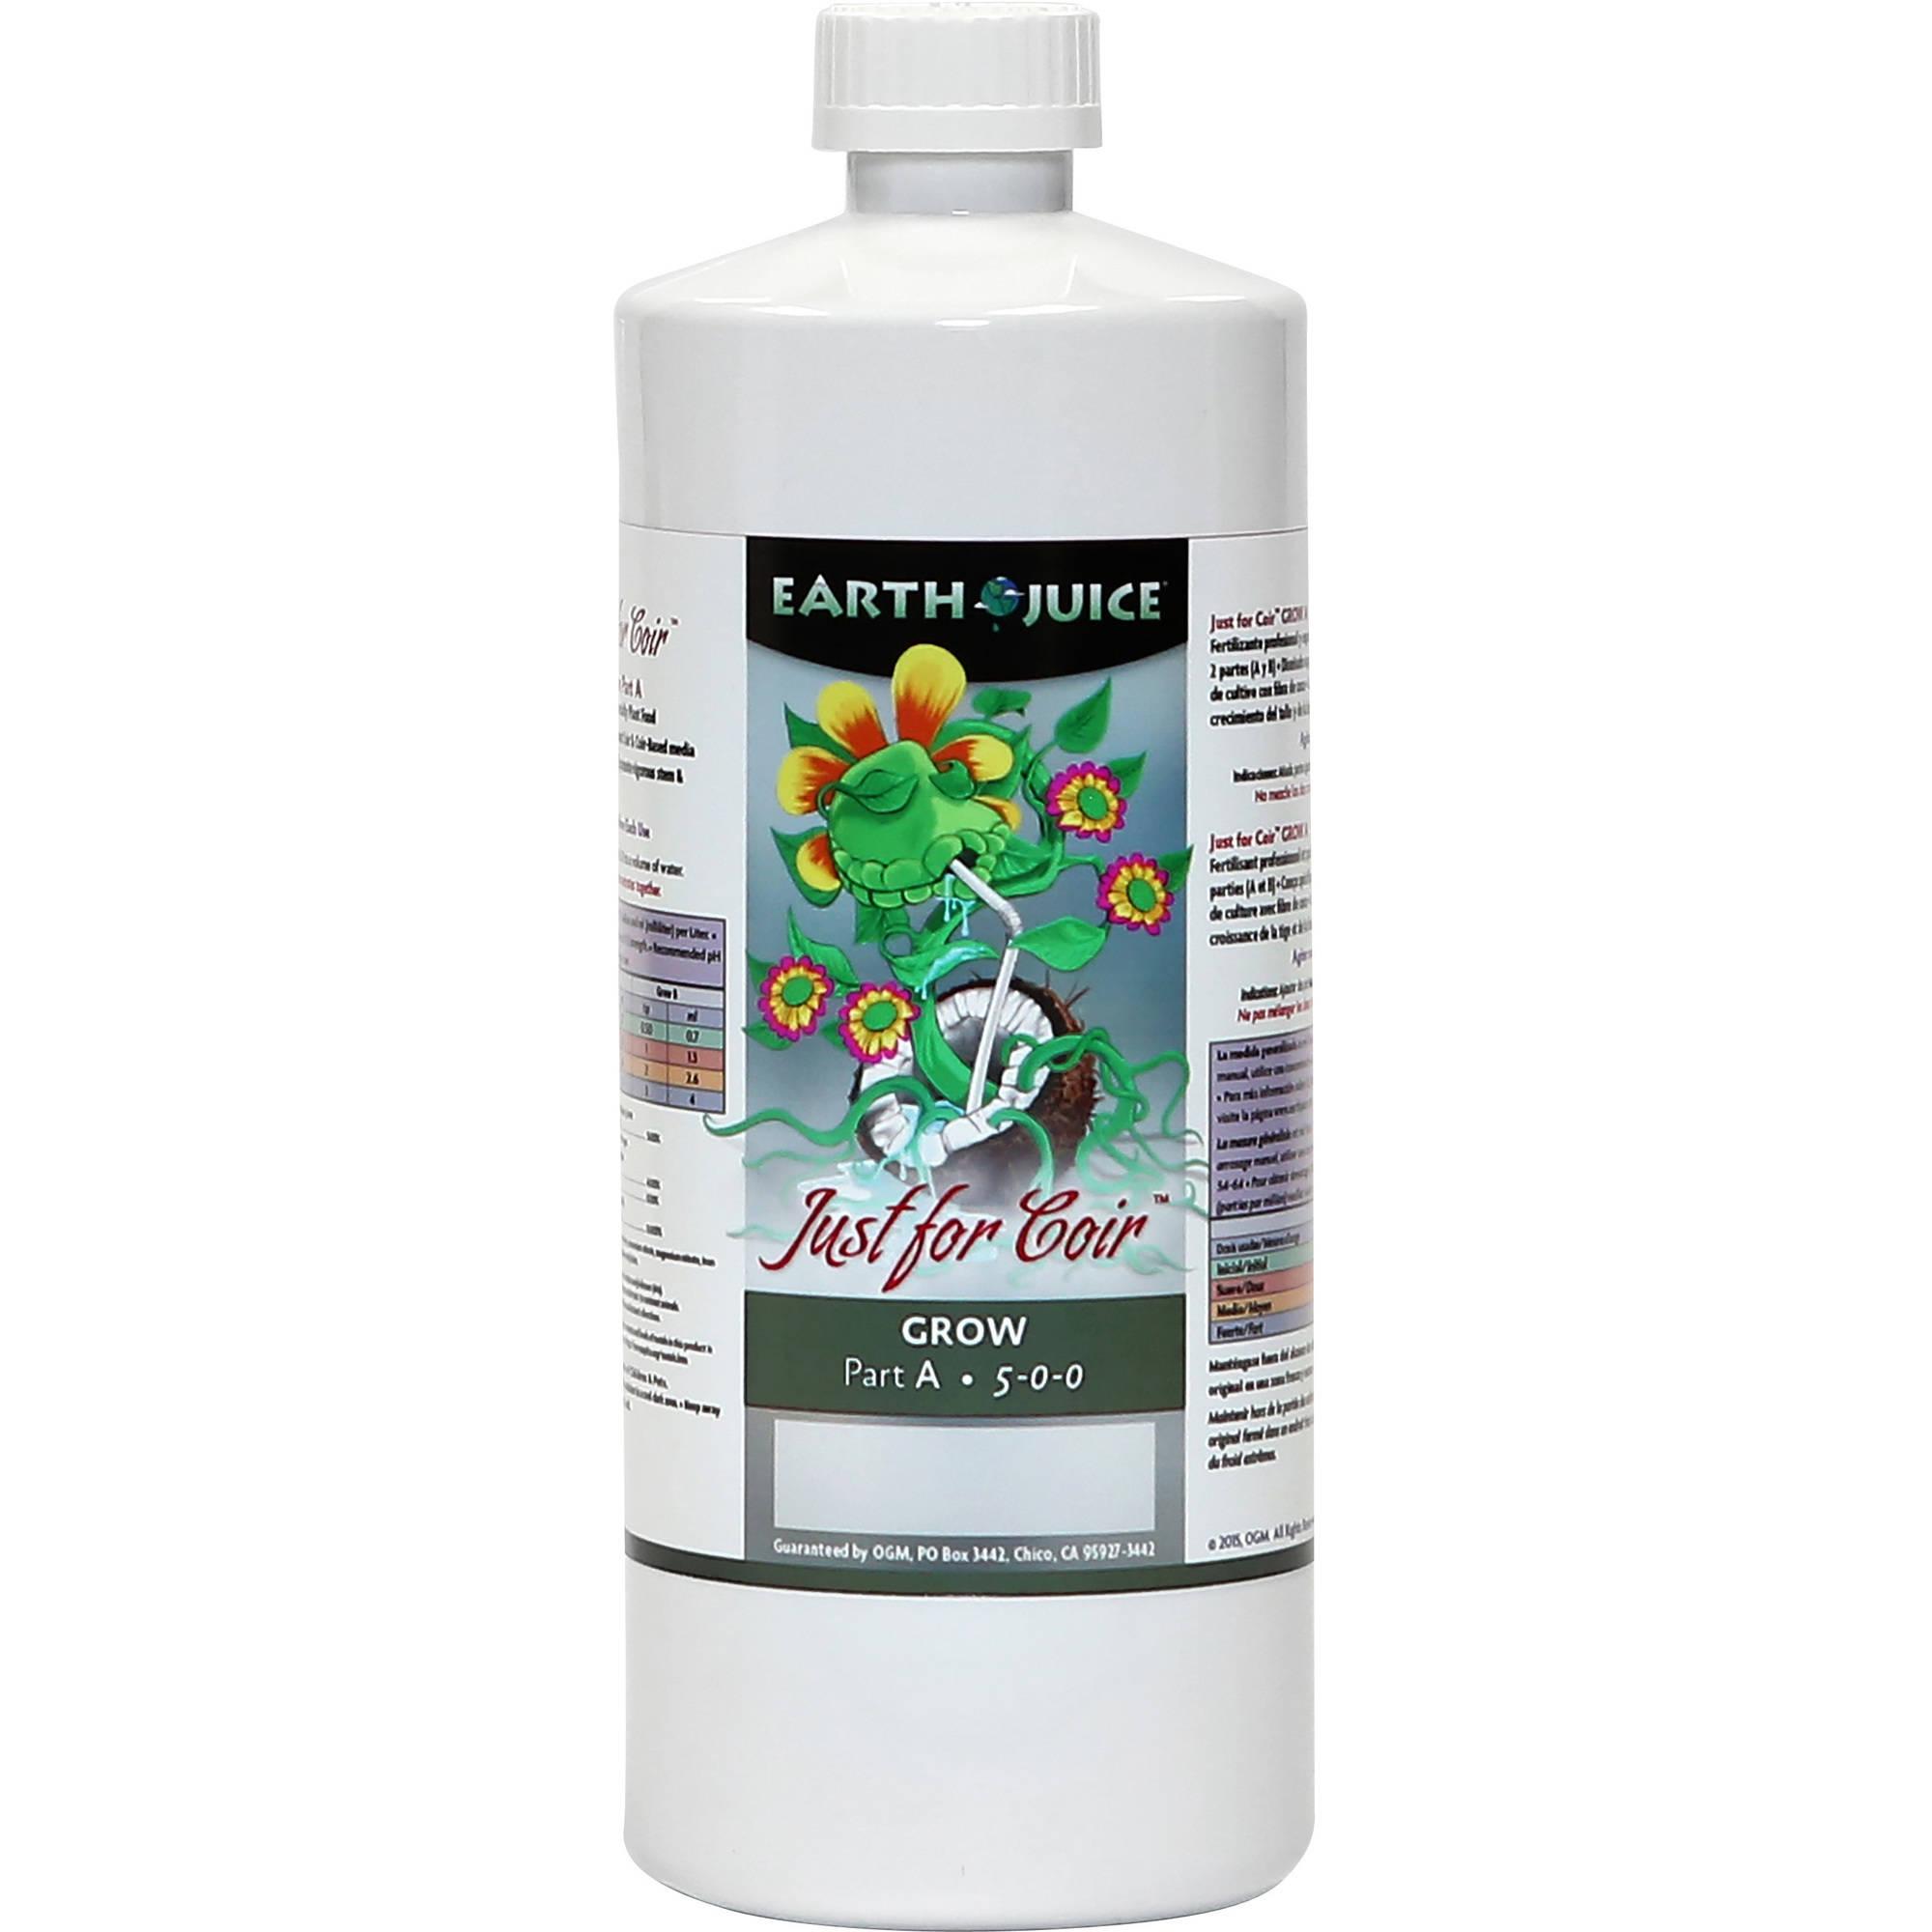 Earth Juice Just for Coir Grow, Part A